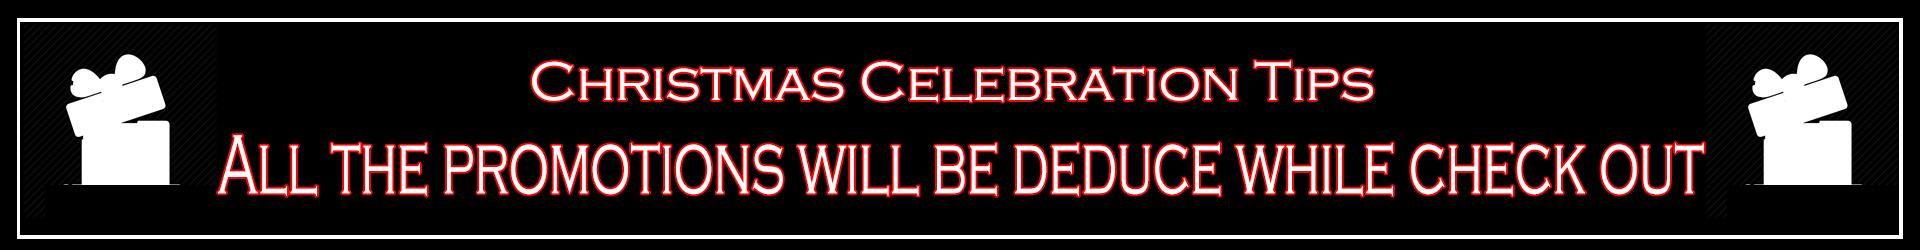 france, 冰桶, ice, bucket, 耶誕節, 聖誕節, merry, christmas, gift, 禮盒, 手工, 高級, highclass, 酒器, wine, accessories, 原裝